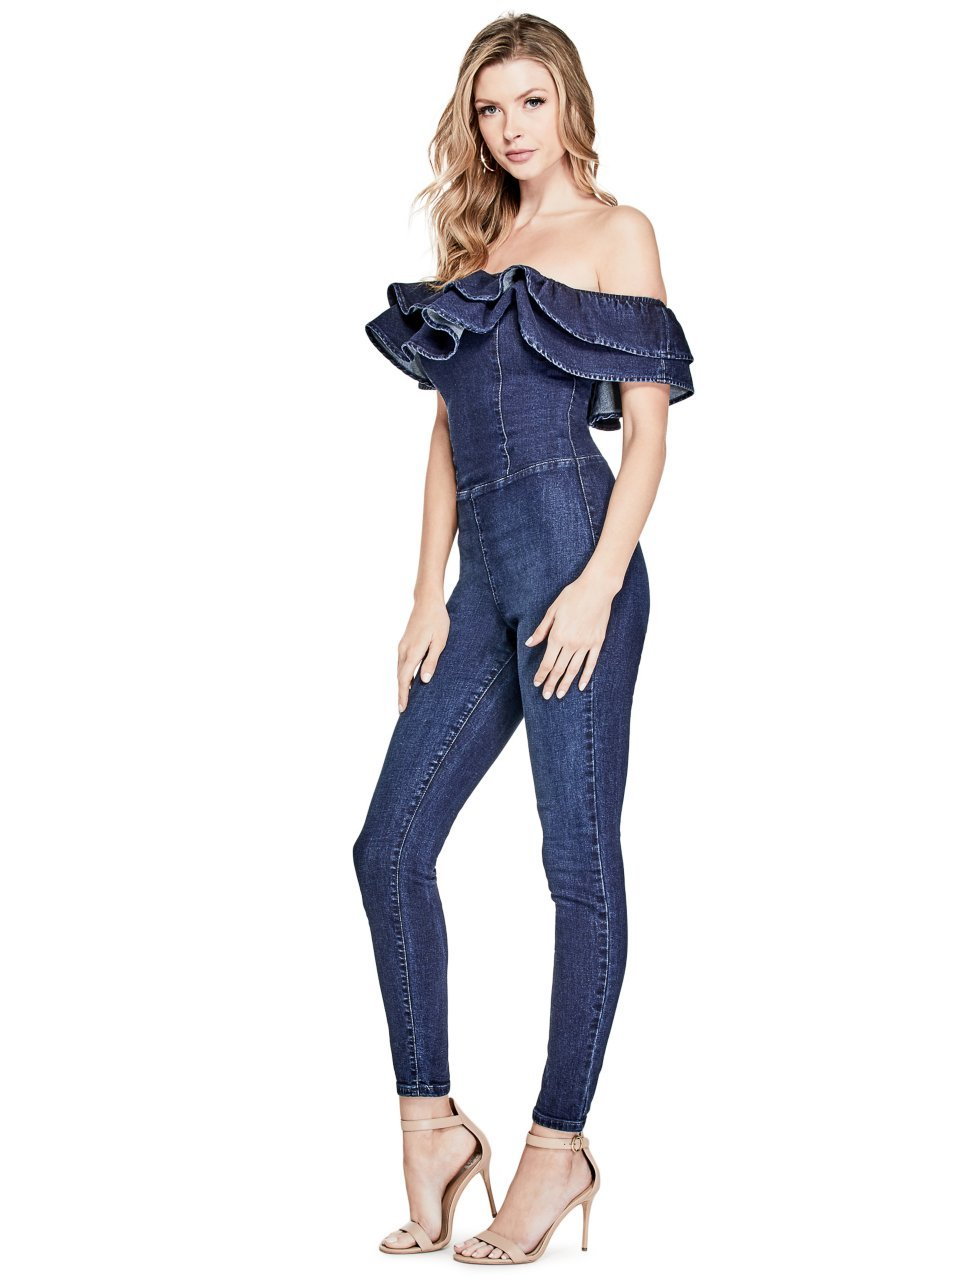 GUESS Women's Ruffle Jumpsuit, Dark Wash, L